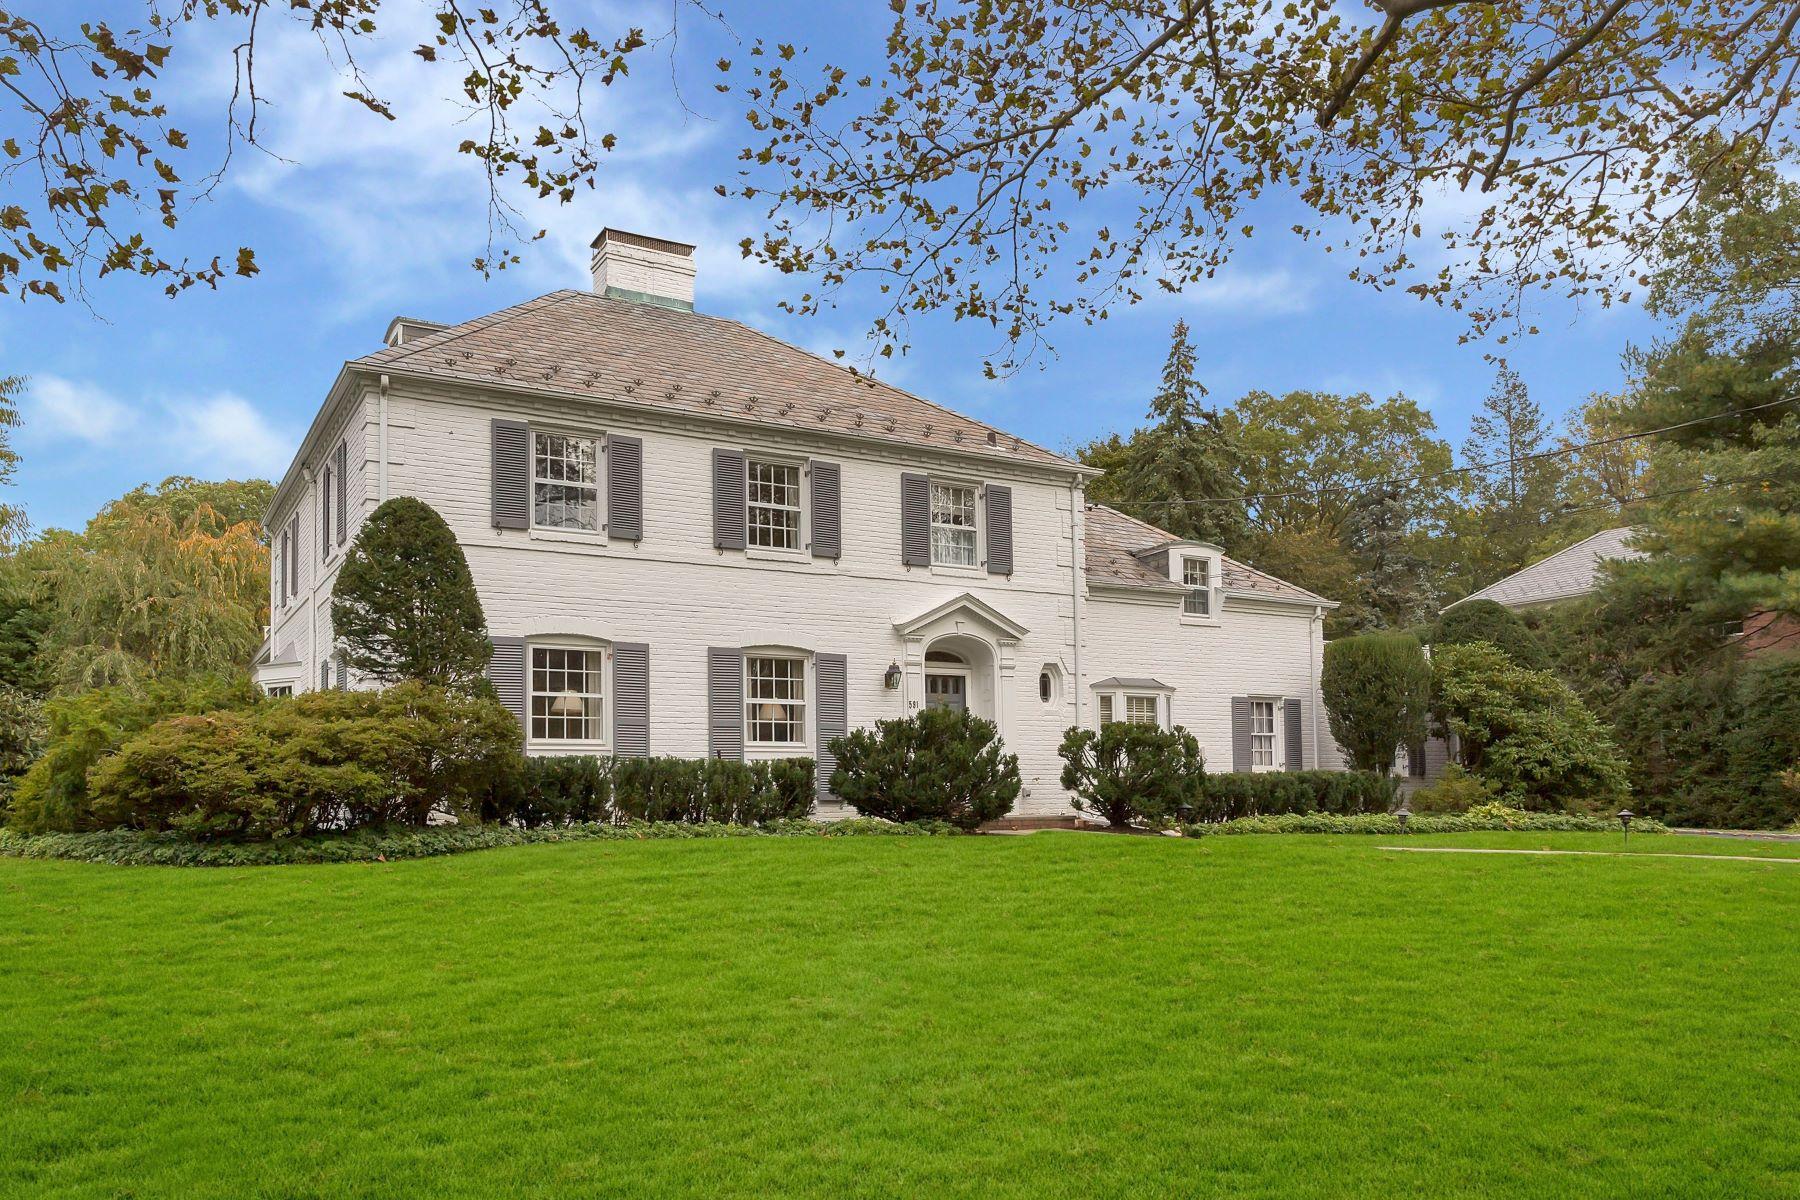 Single Family Homes for Sale at Manhasset 591 Park Ave Manhasset, New York 11030 United States